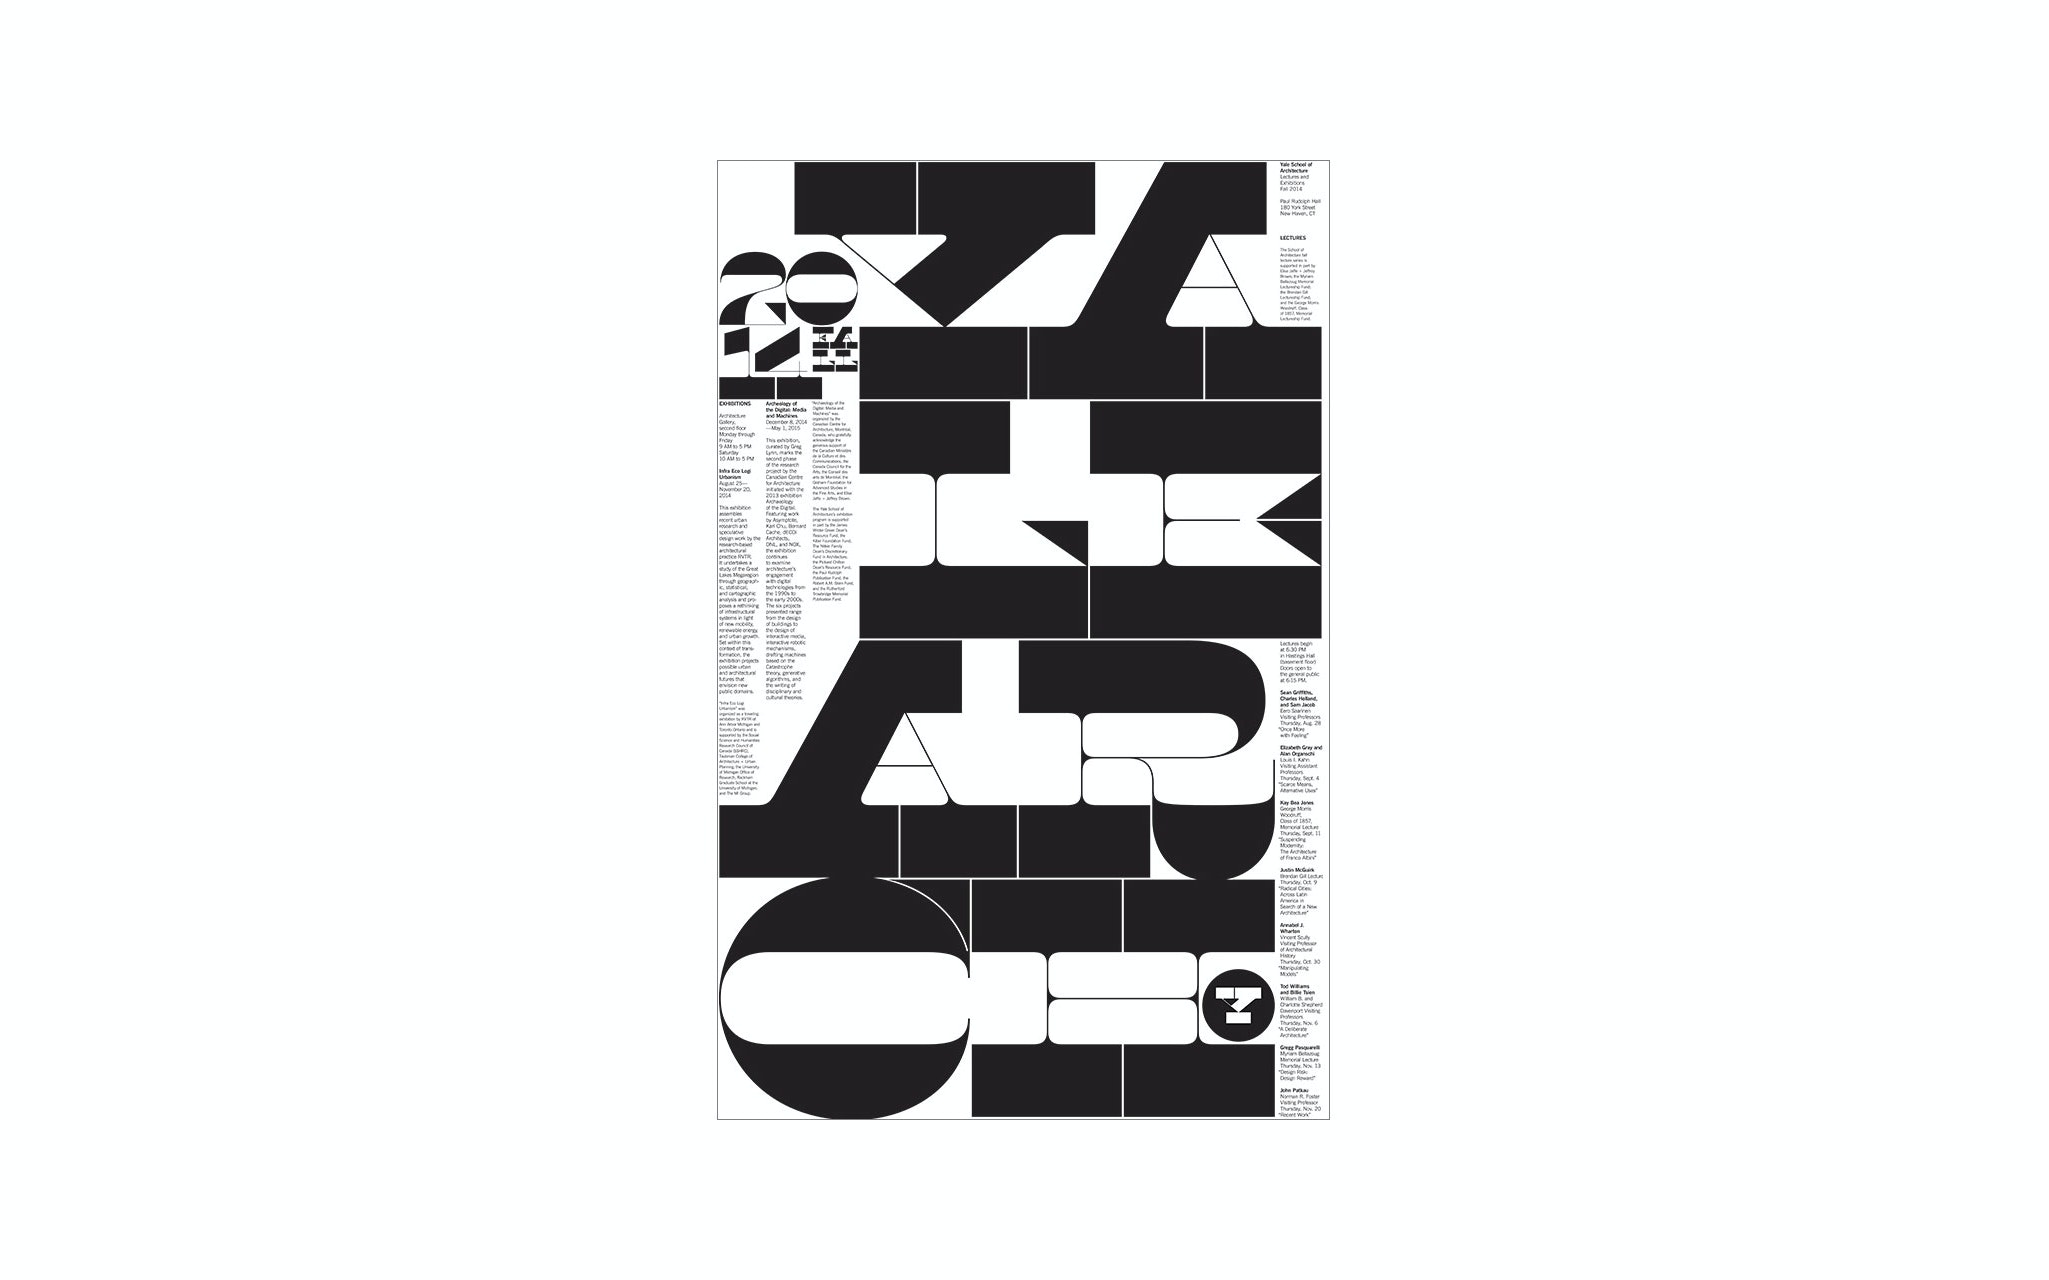 yale school of architecture — pentagram